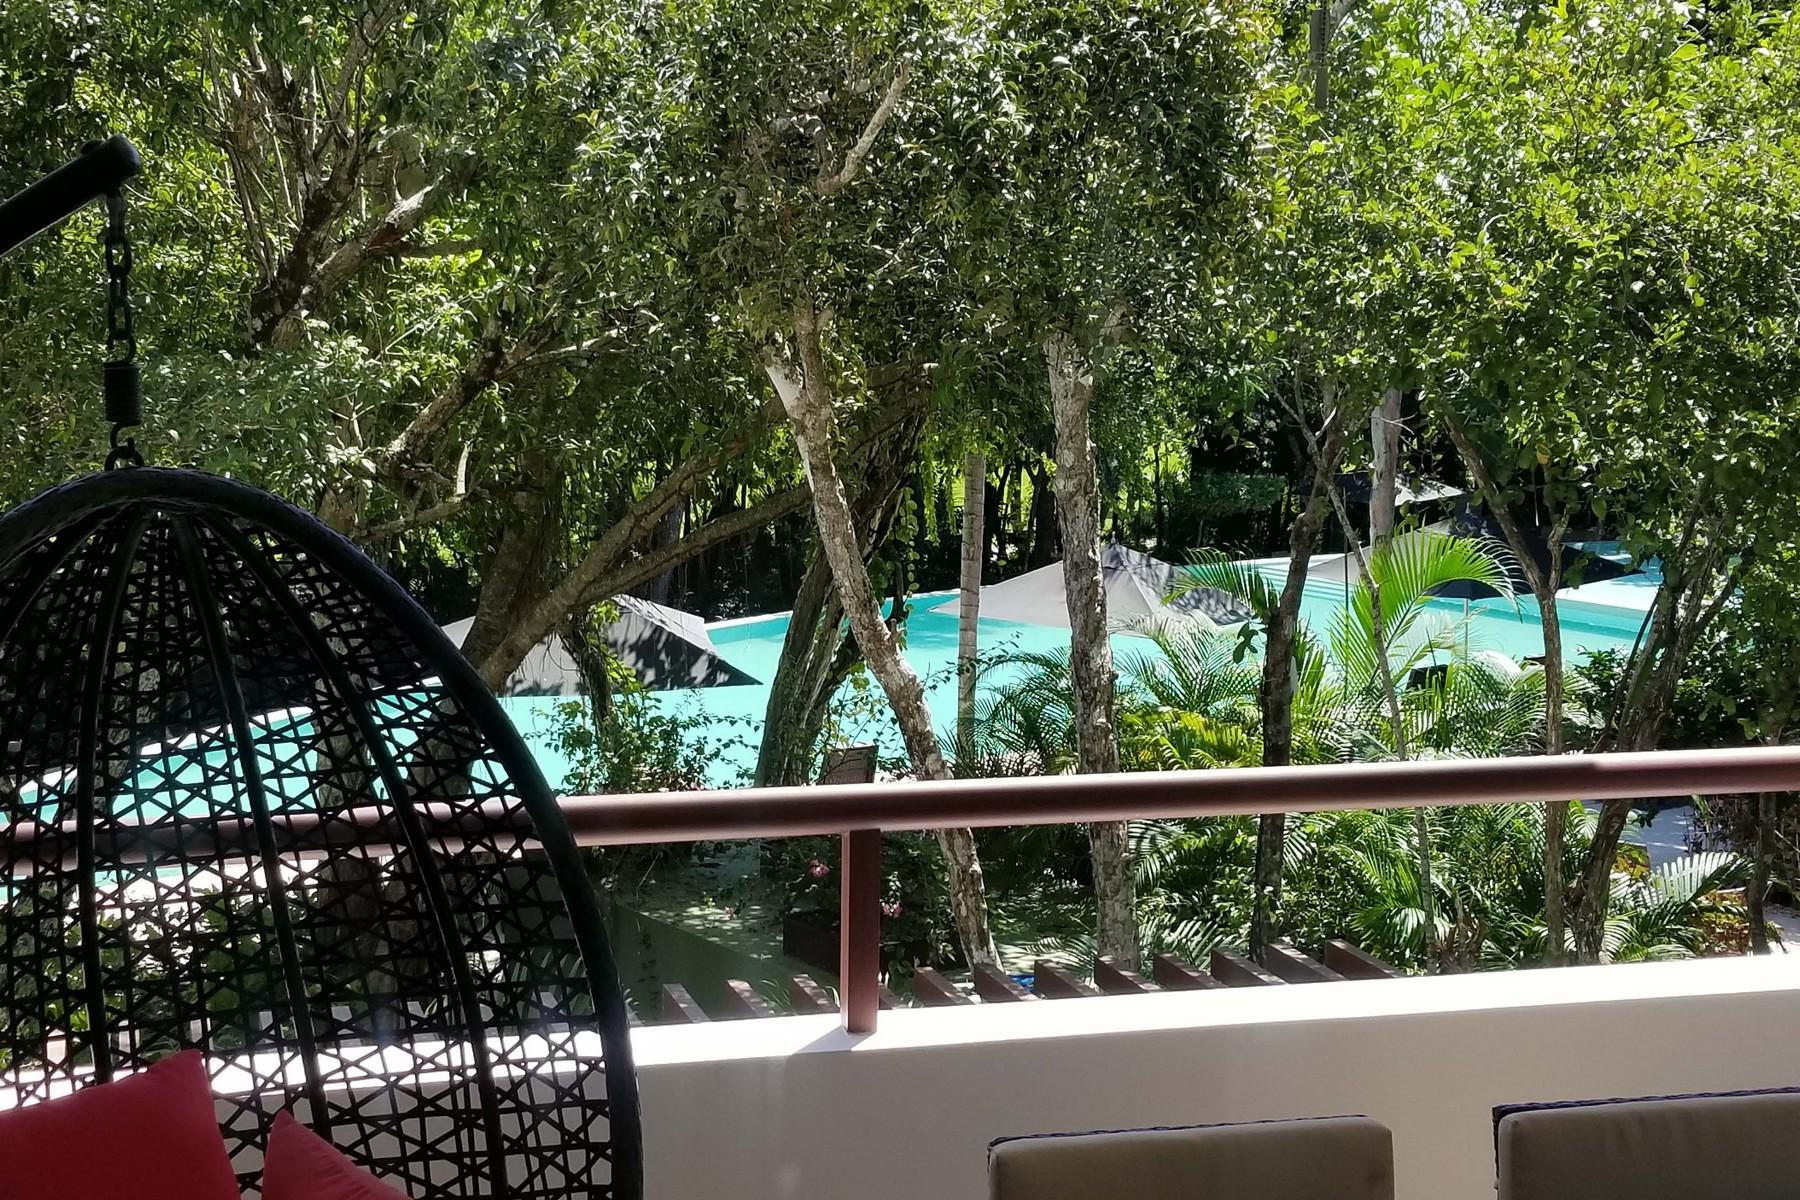 Additional photo for property listing at INSPIRING CONDO IN TAO COMMUNITY Inspiring Condo in Tao Community Carretera federal chetumal- B.Juarez km 250 Akumal, Quintana Roo 77750 Mexico